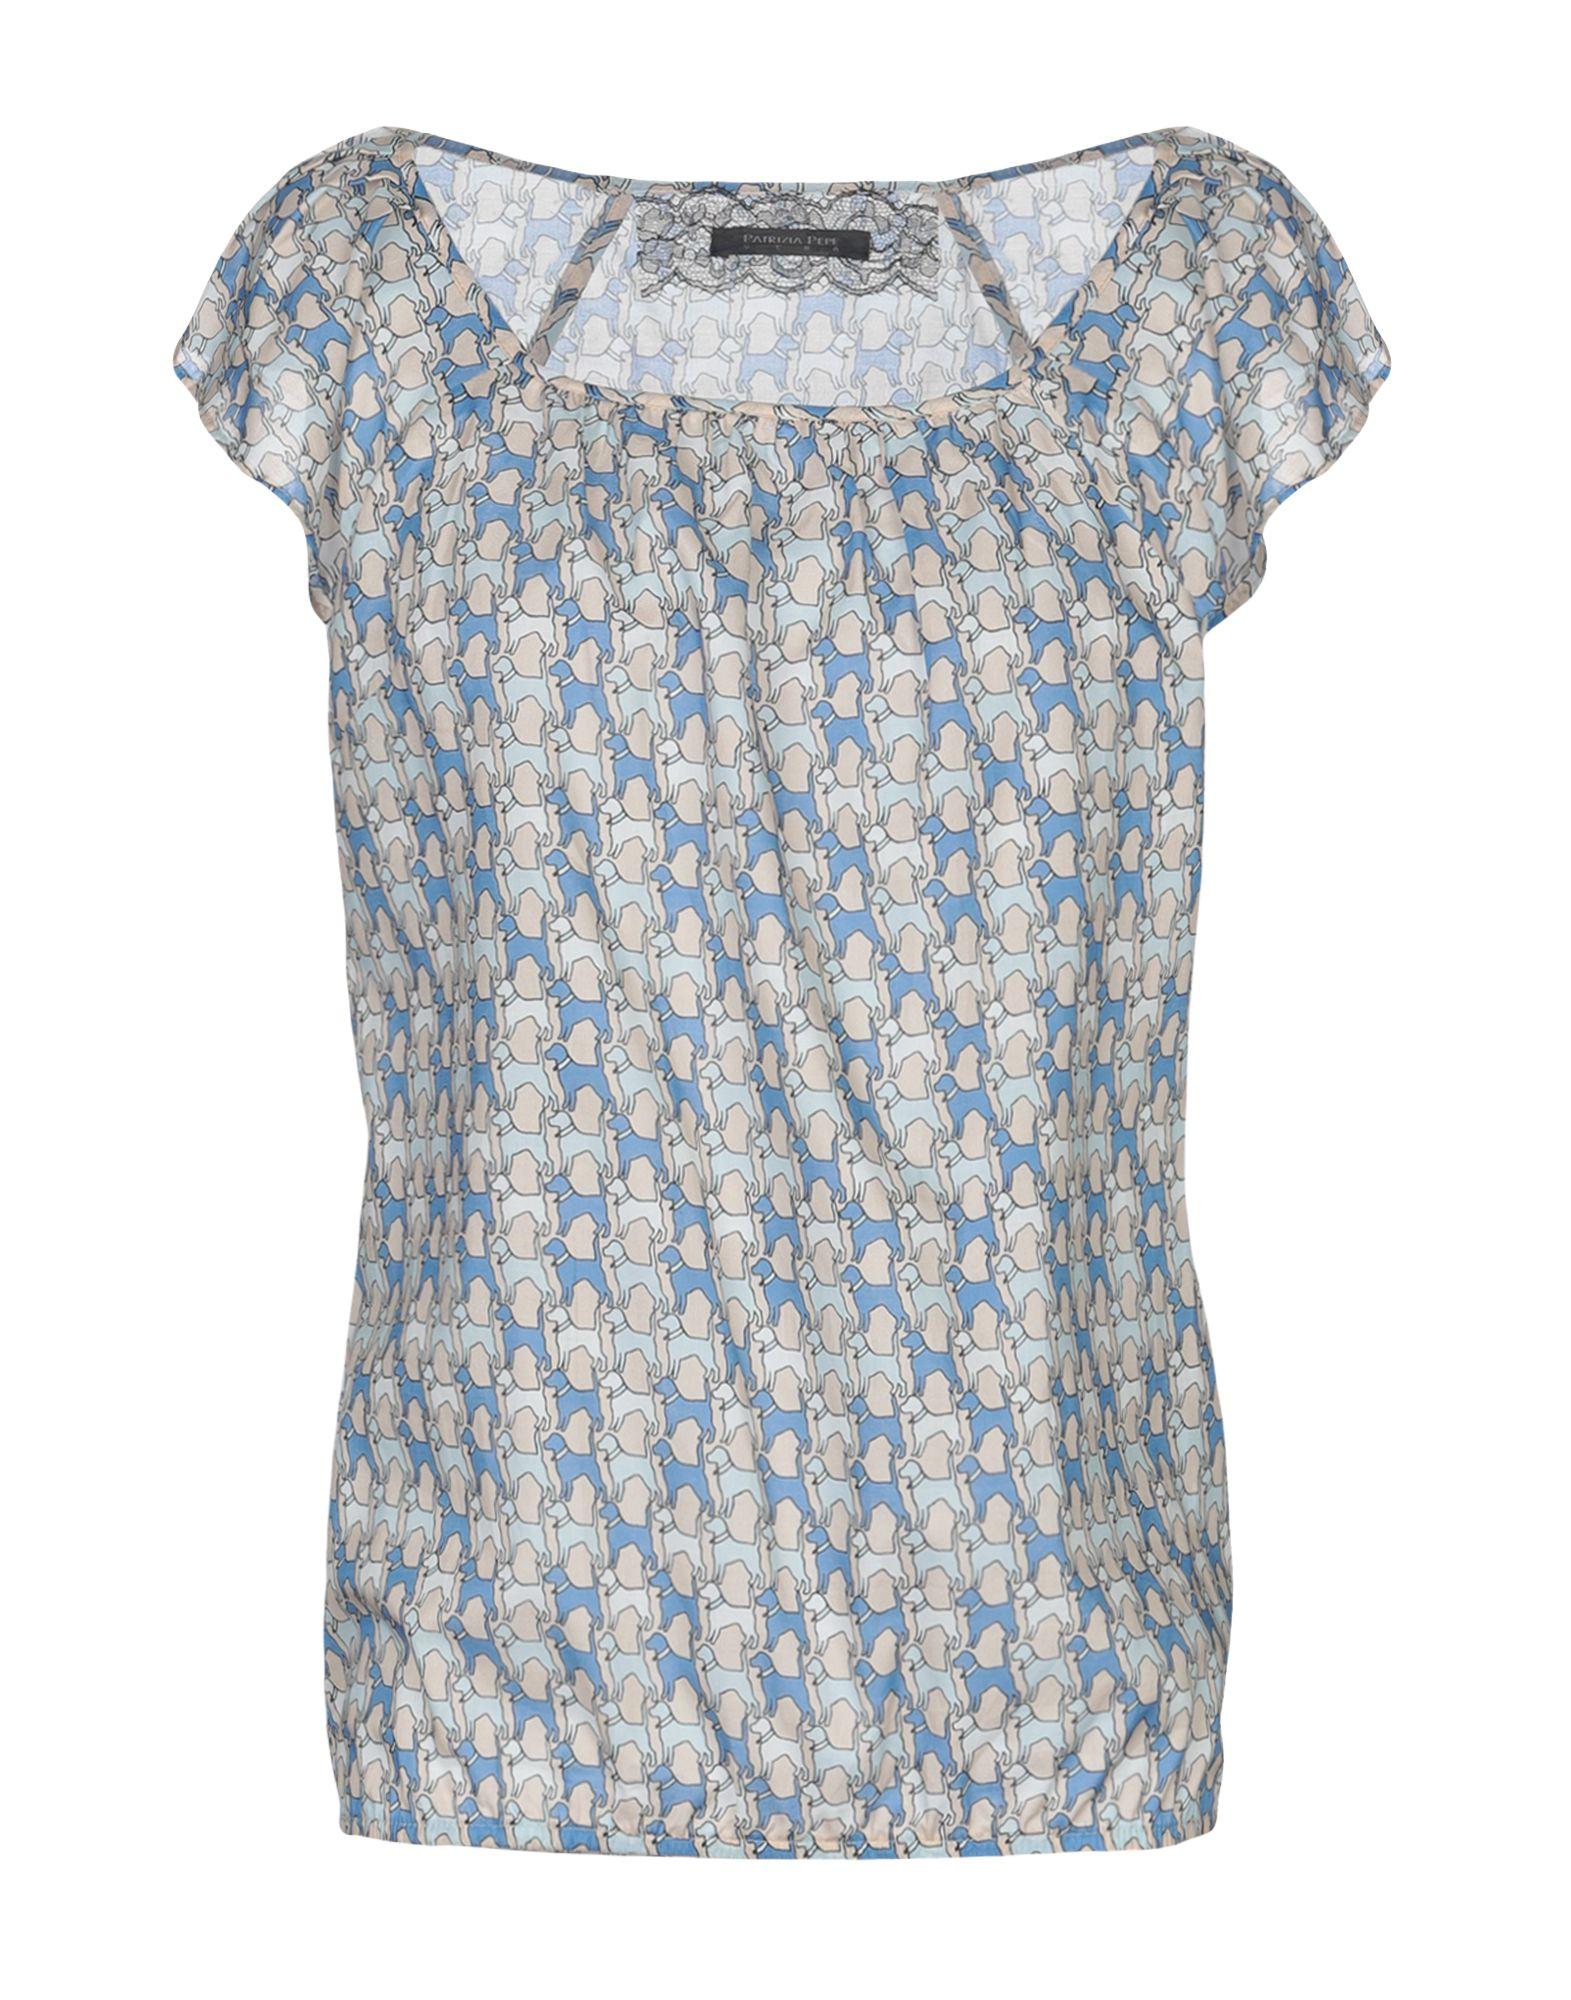 цены на PATRIZIA PEPE SERA Блузка  в интернет-магазинах